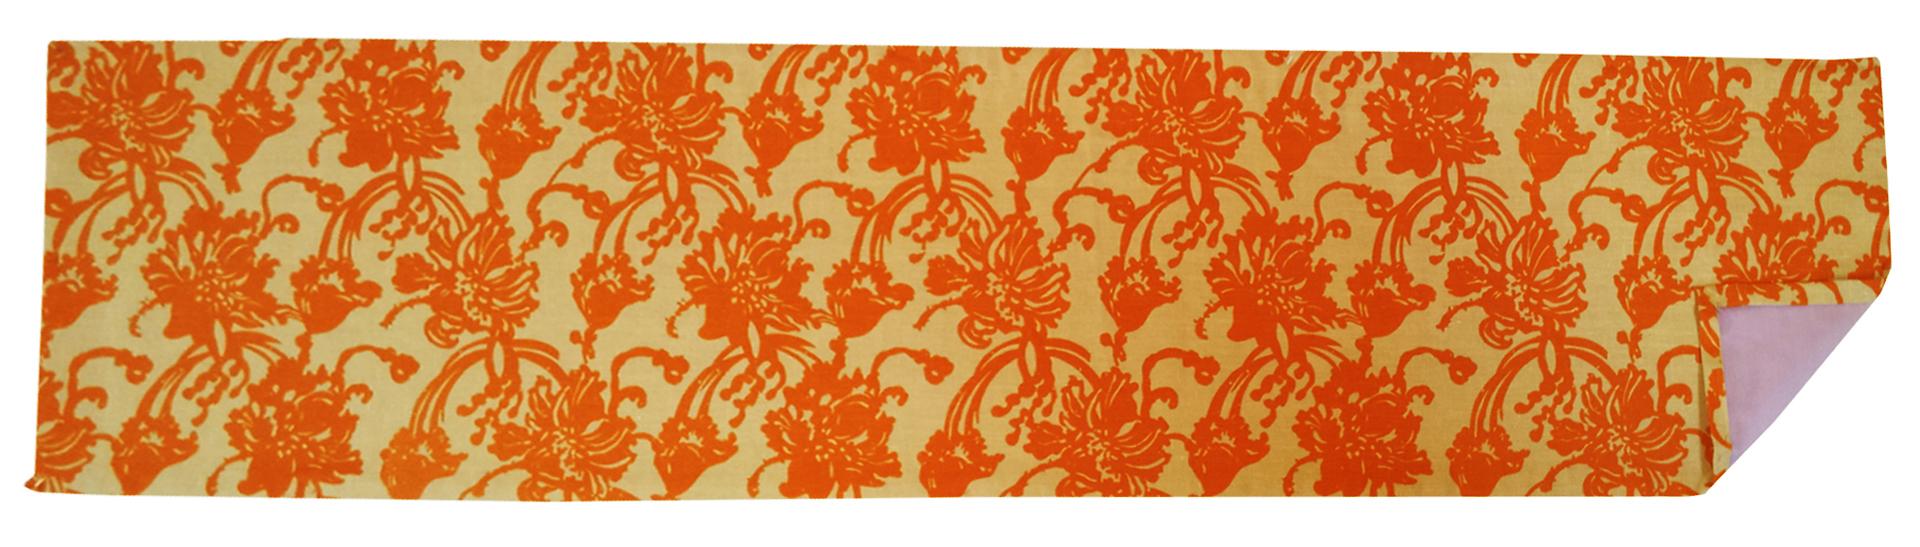 "Poppies, orange on beige linen   table runner, 75"" x 16"""